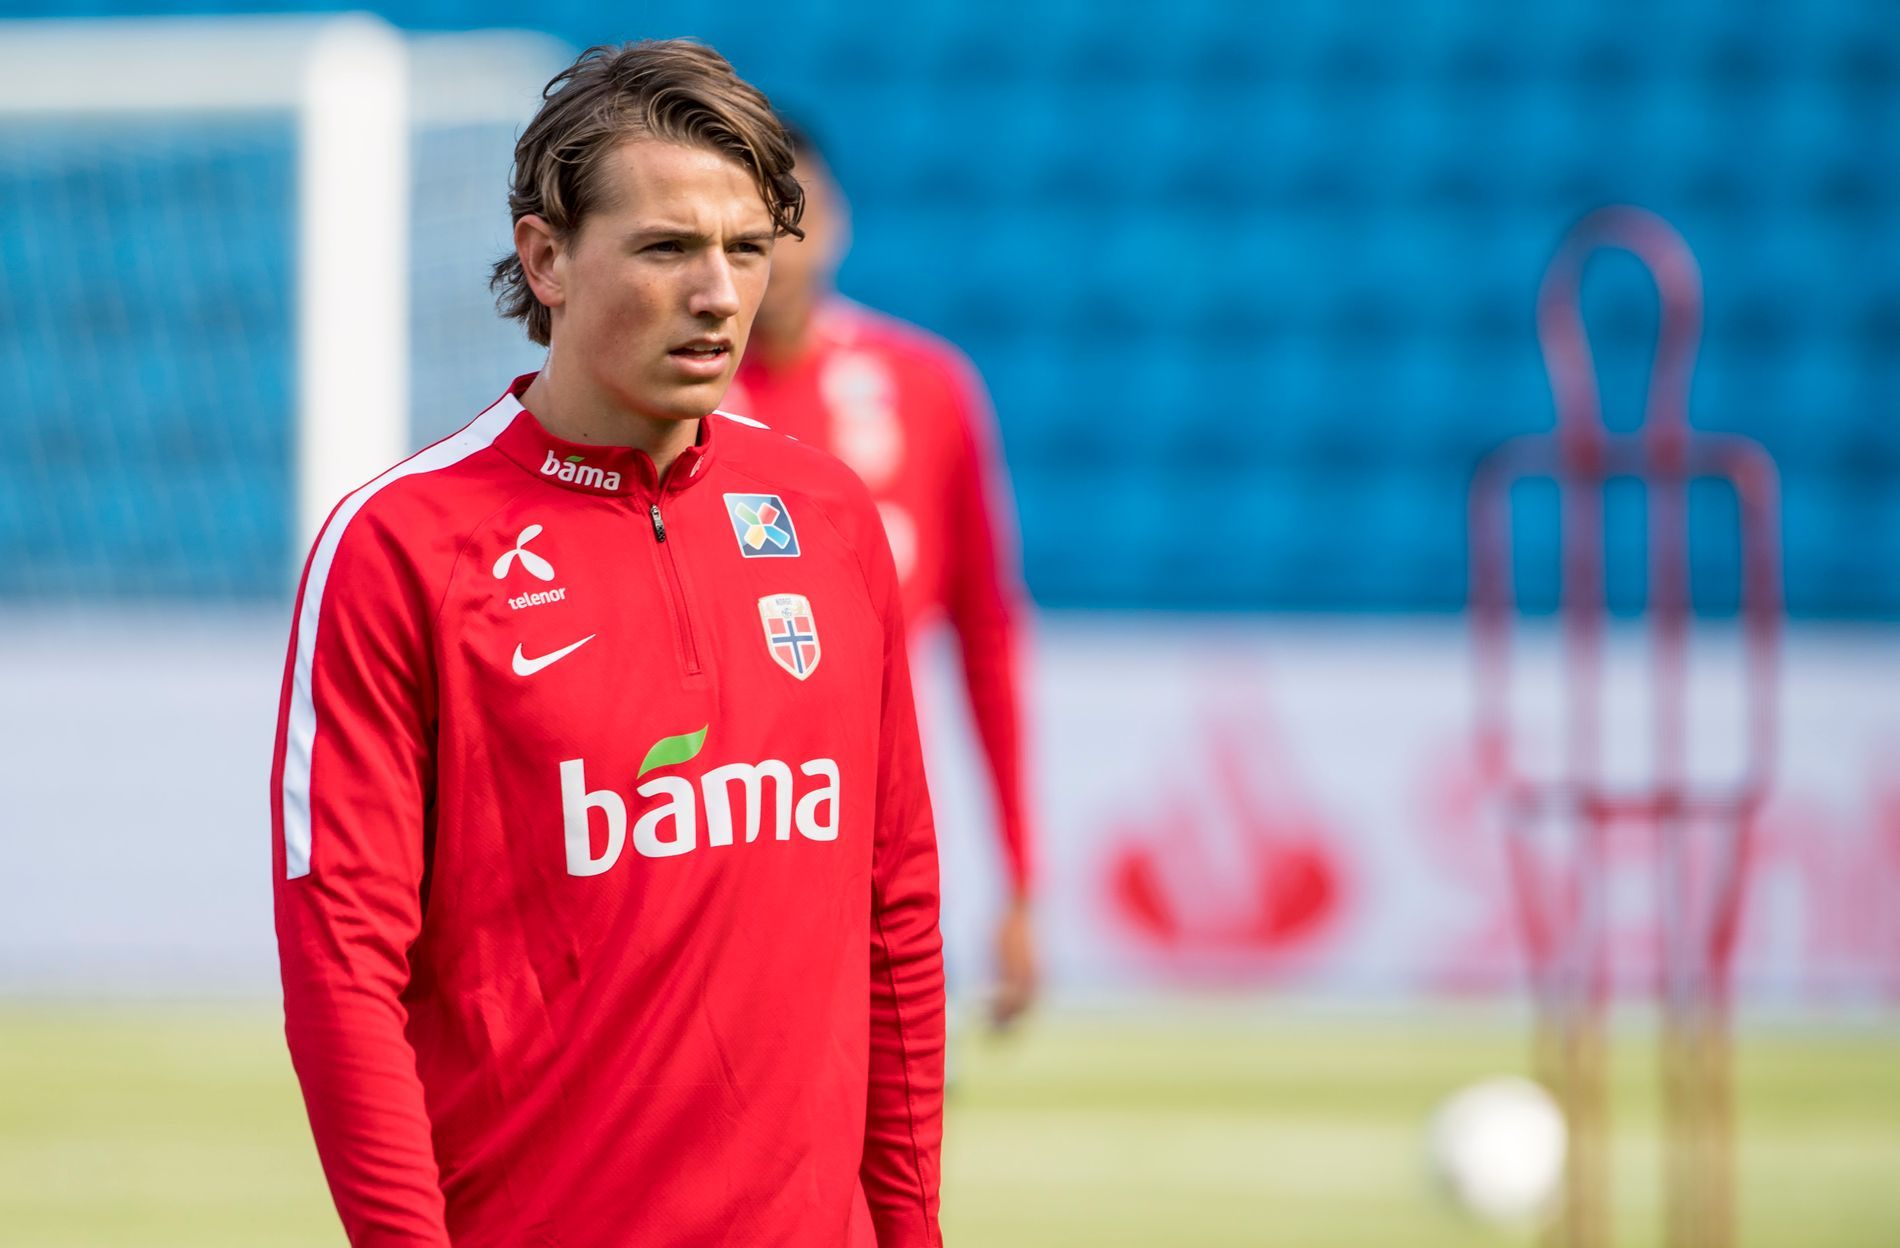 TAPER «ALDRI»: Sander Berge, her under landslagets trening på Ullevaal Stadion tirsdag 4. september, har ikke tapt en fotballkamp siden comebacket fra skade.